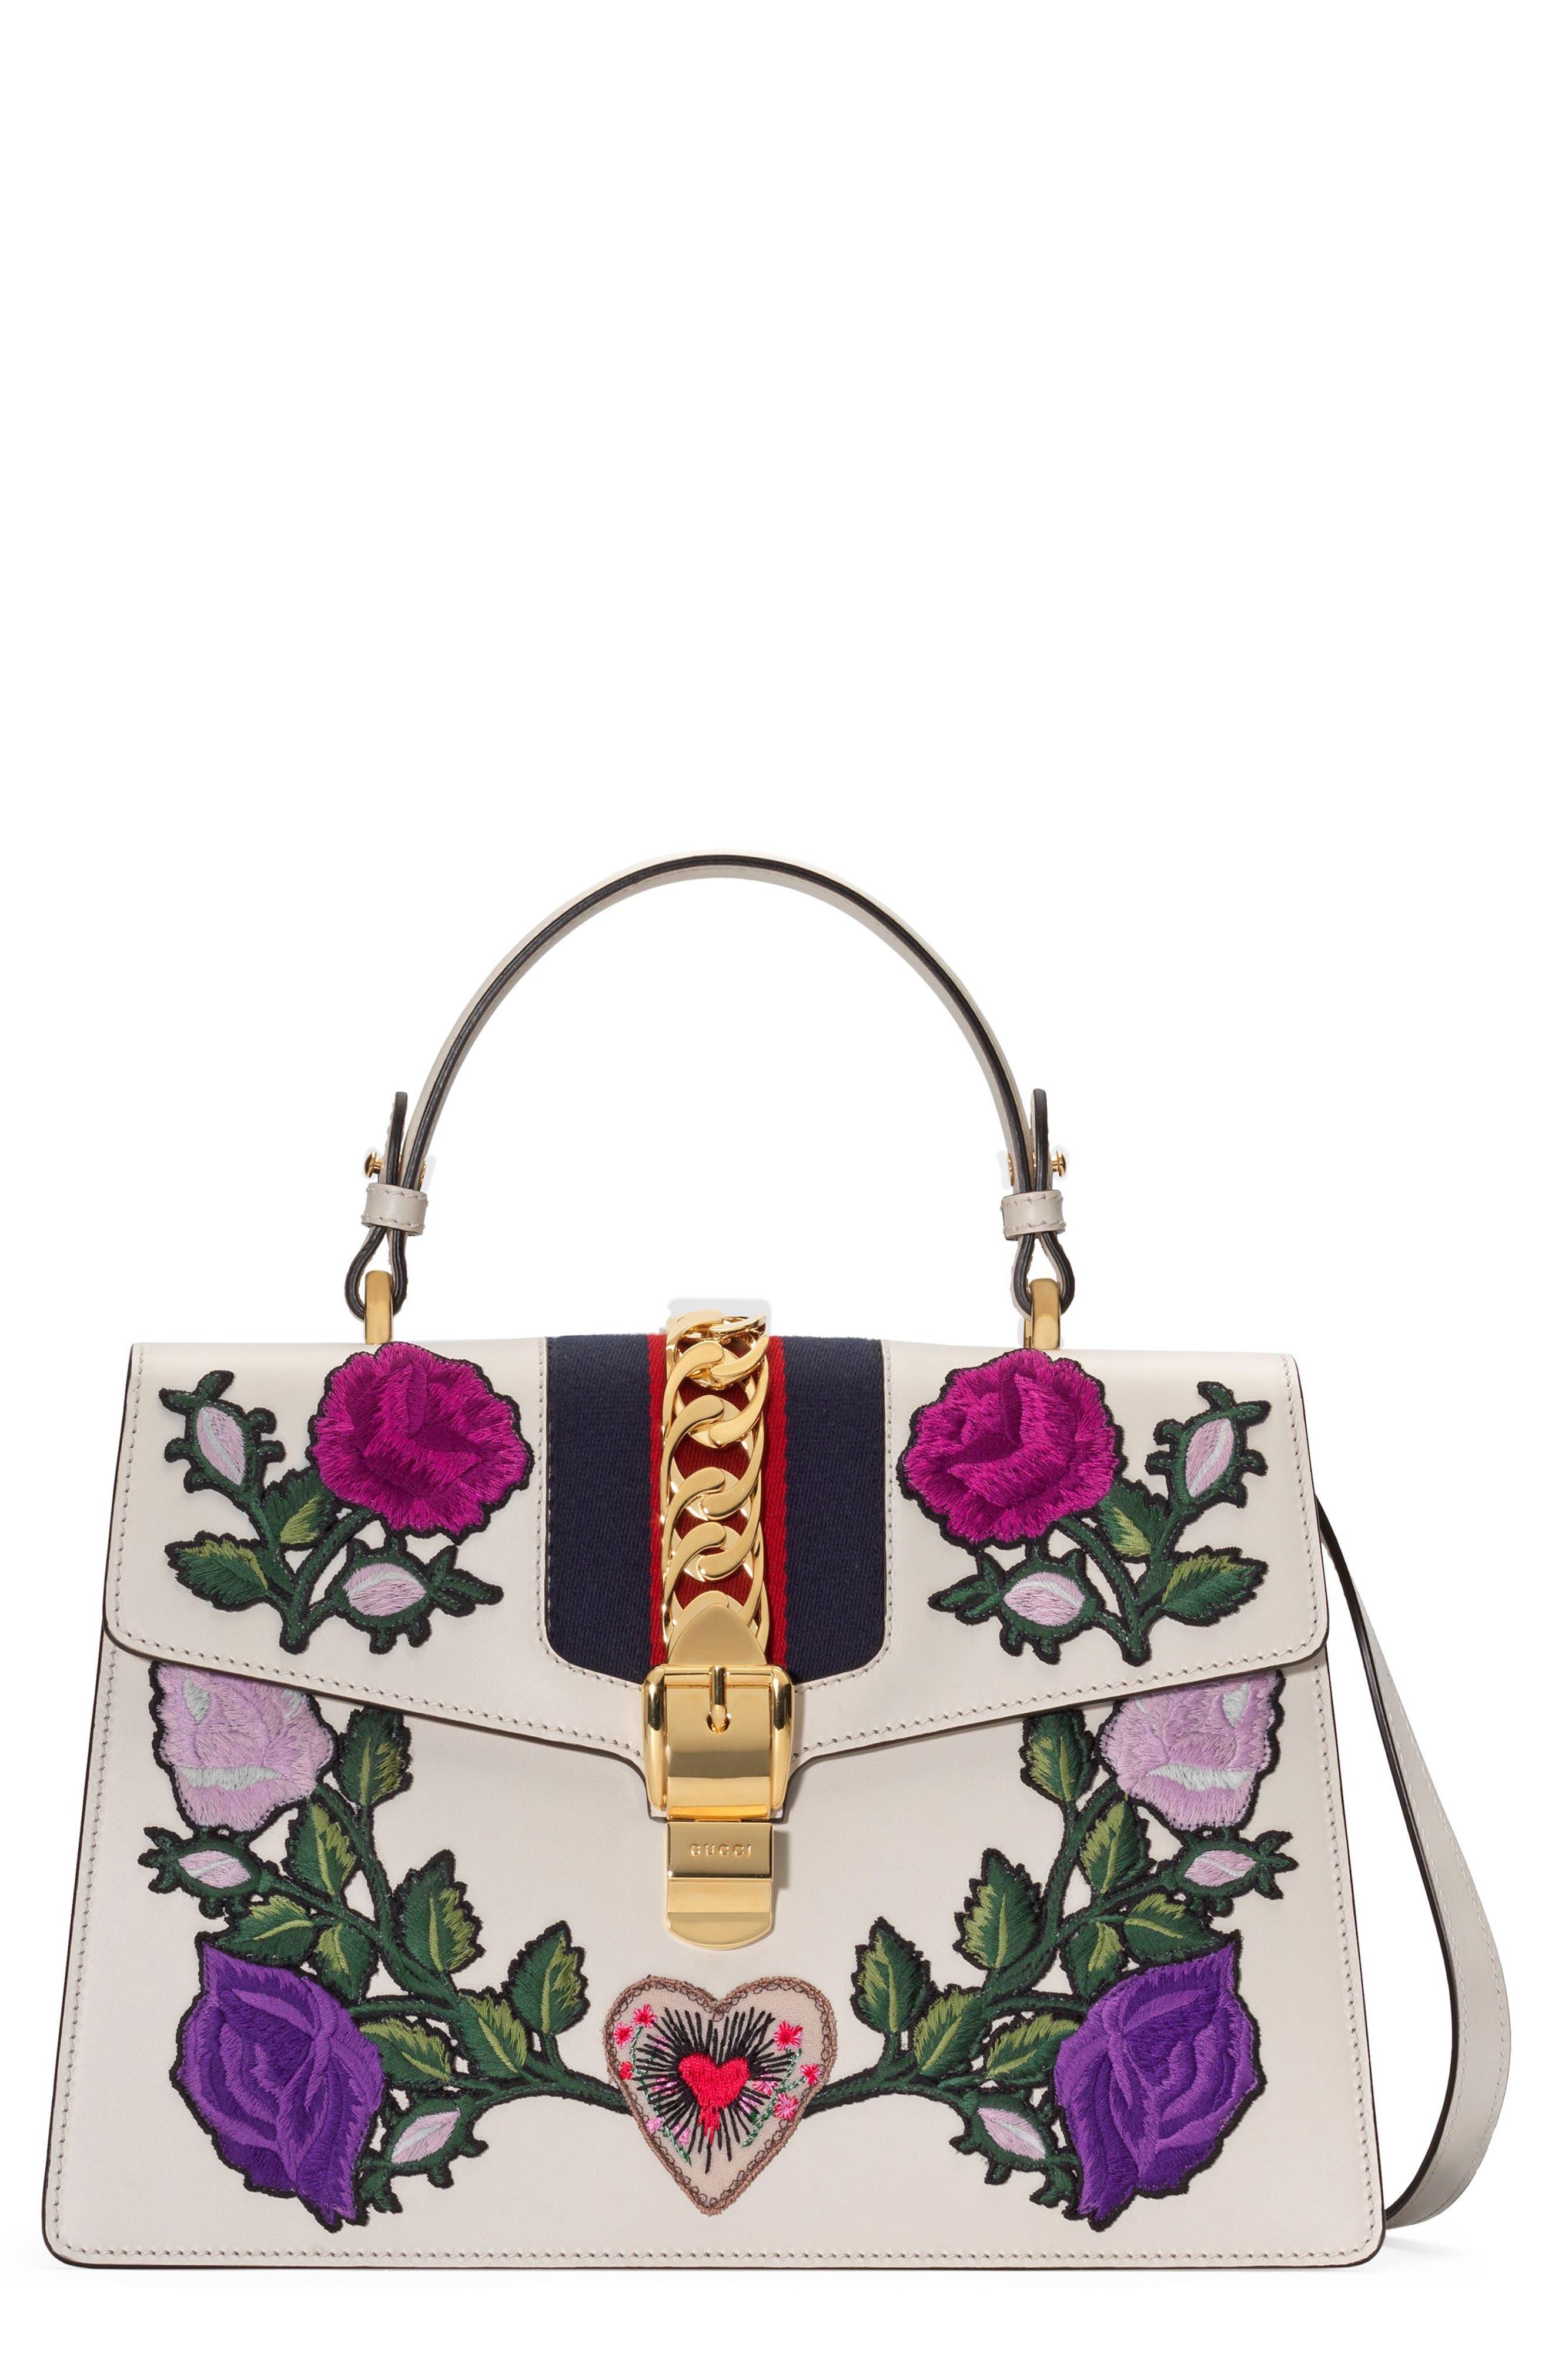 Main Image - Gucci Medium Sylvie Floral Patch Top Handle Leather Shoulder Bag